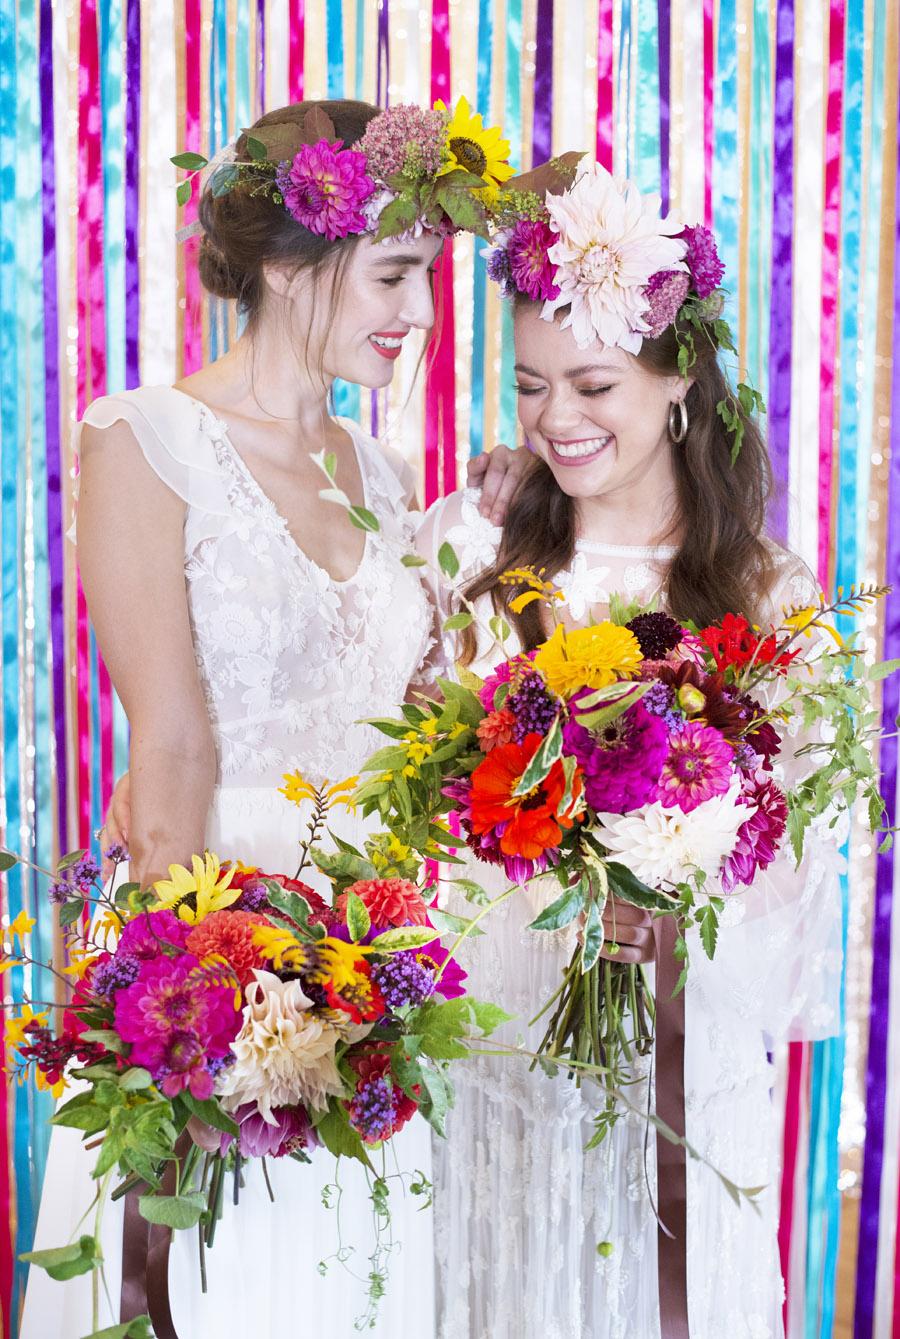 Same sex wedding styling boho chic festival inspiration - image credit Emma Hall Photography (7)